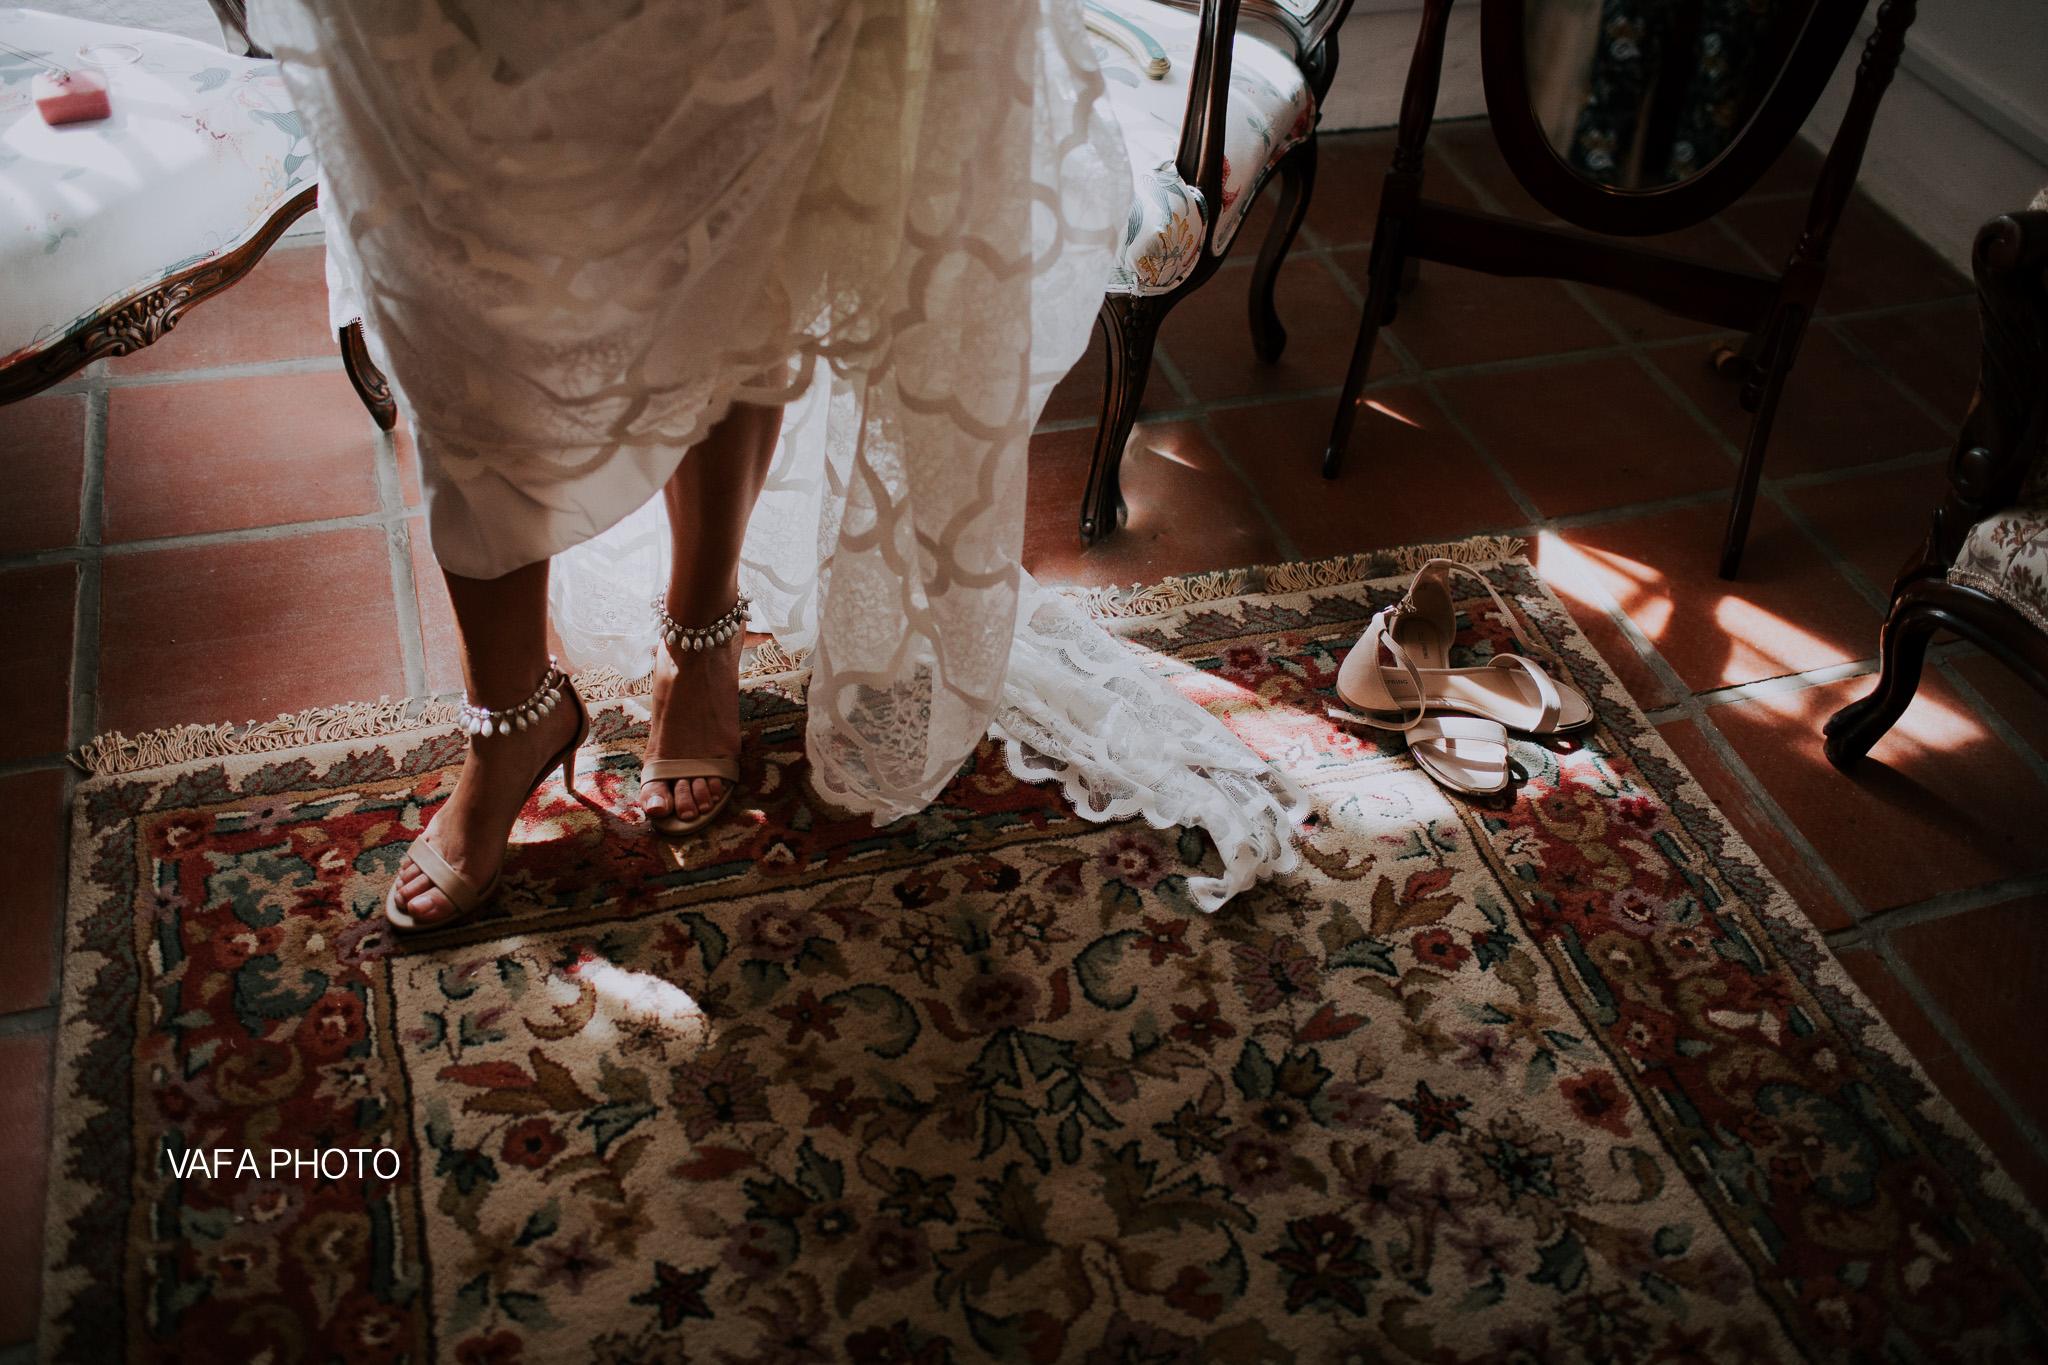 Leo-Carrillo-Ranch-Wedding-Lauren-Mike-Vafa-Photo-161.jpg